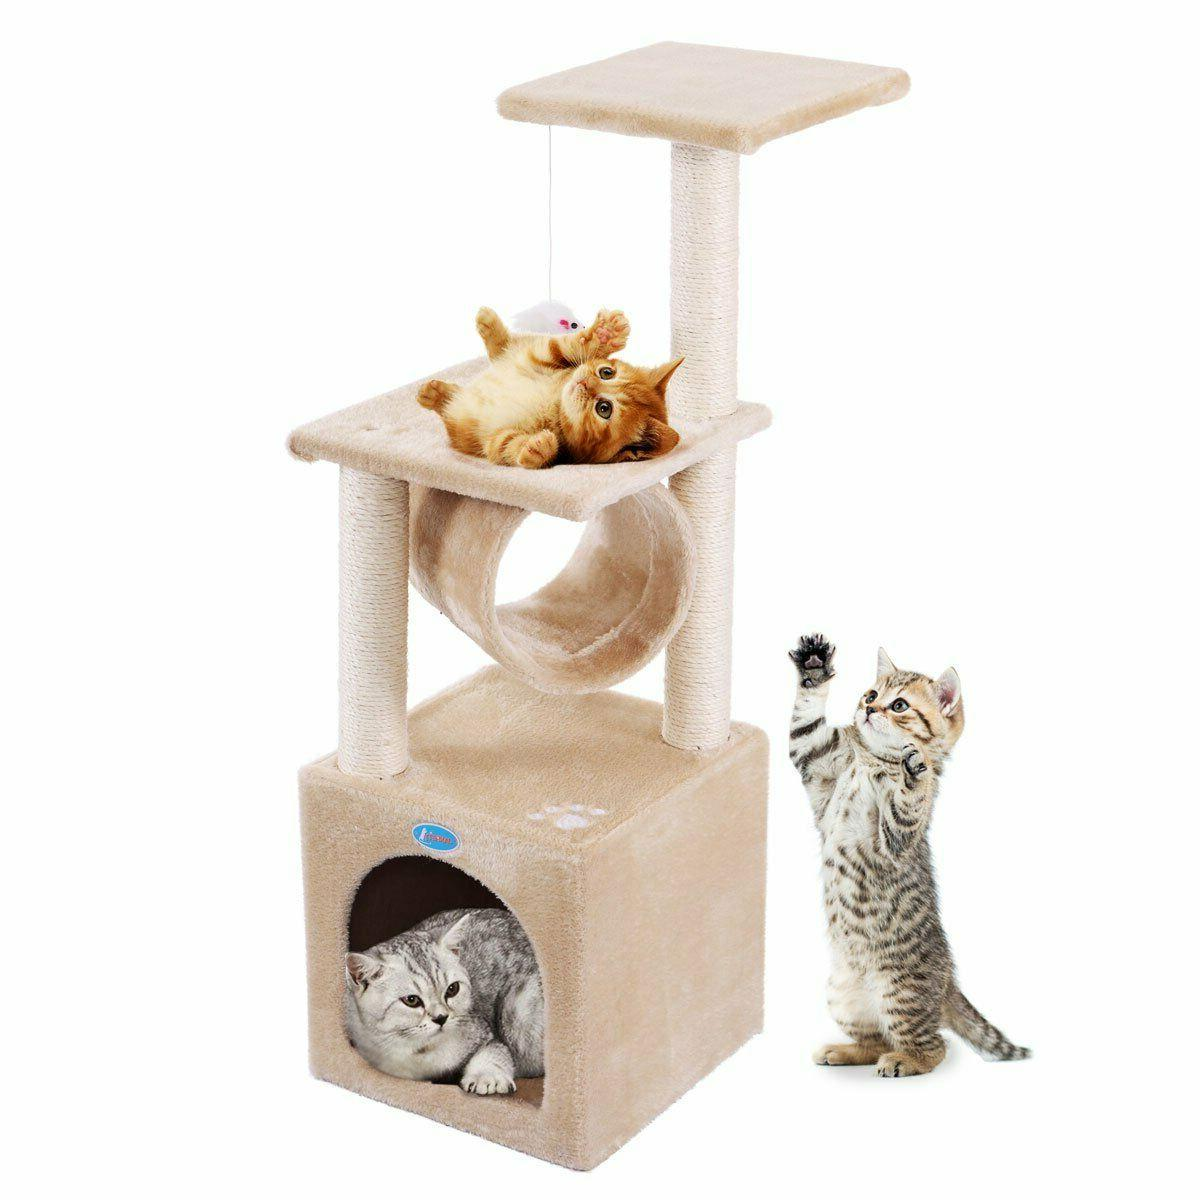 deluxe 36 cat tree condo furniture play